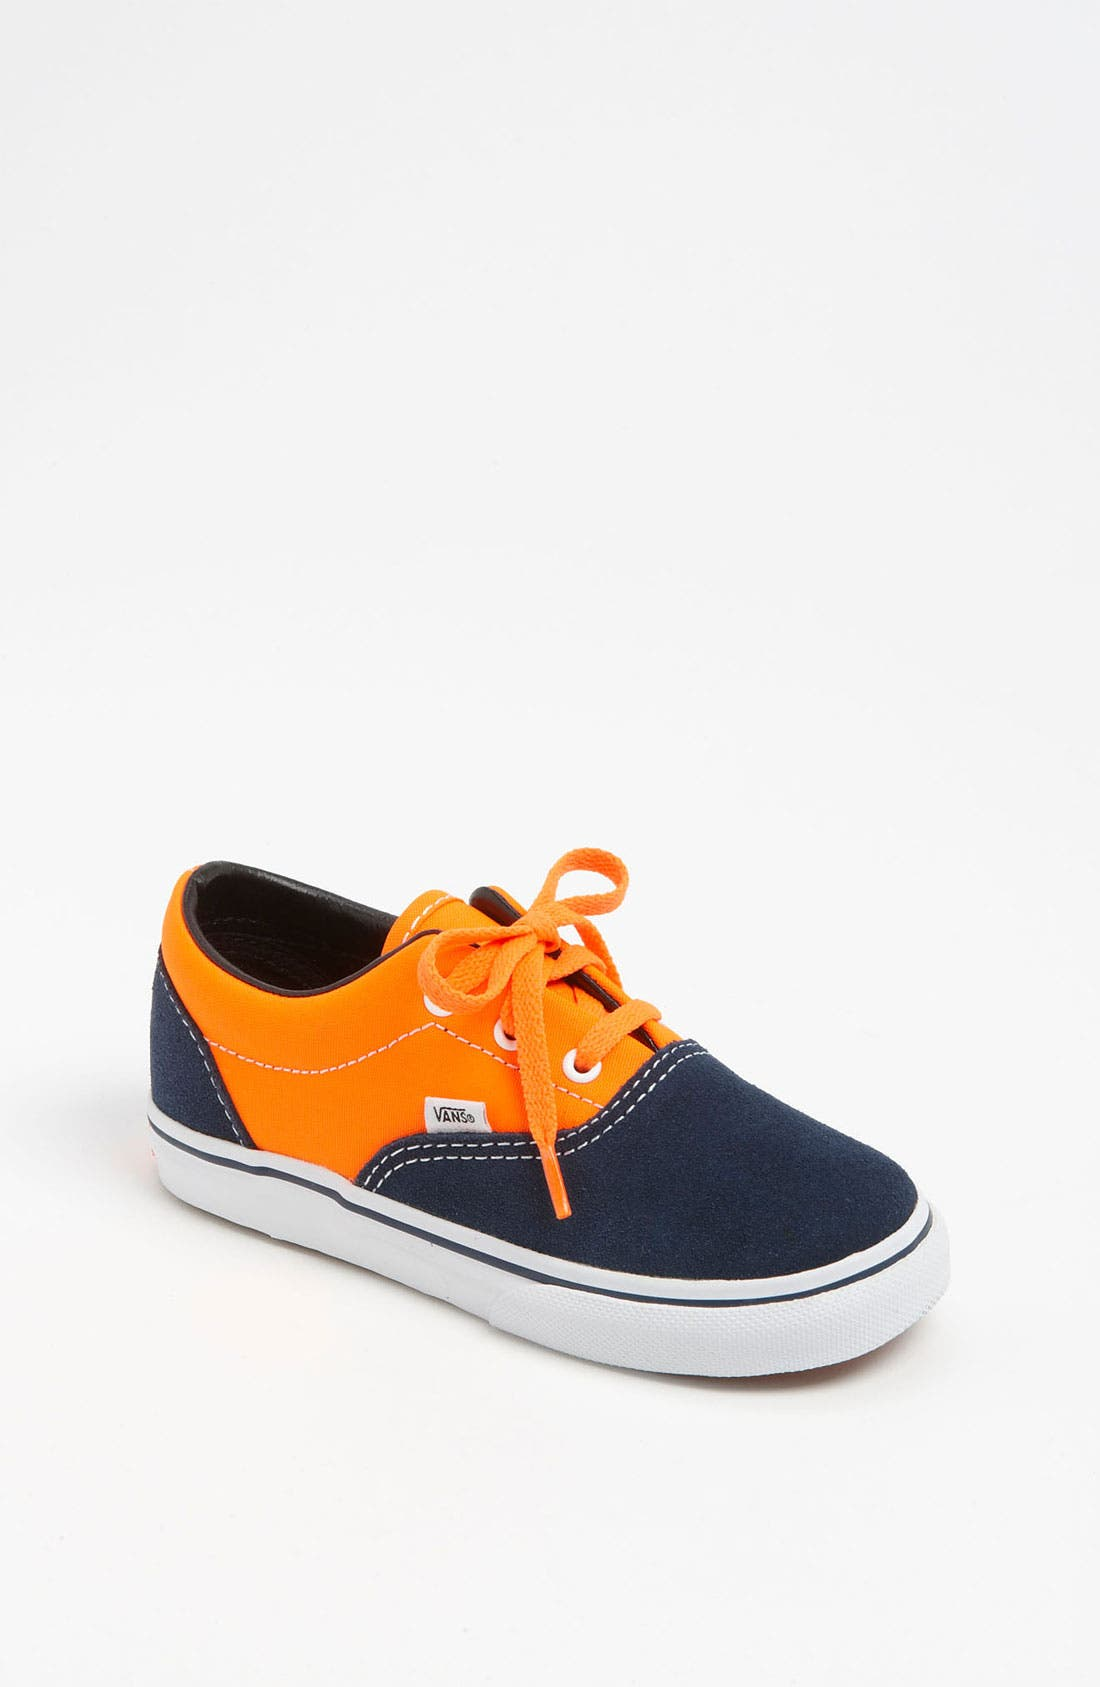 Main Image - Vans 'Era' Sneaker (Baby, Walker & Toddler)